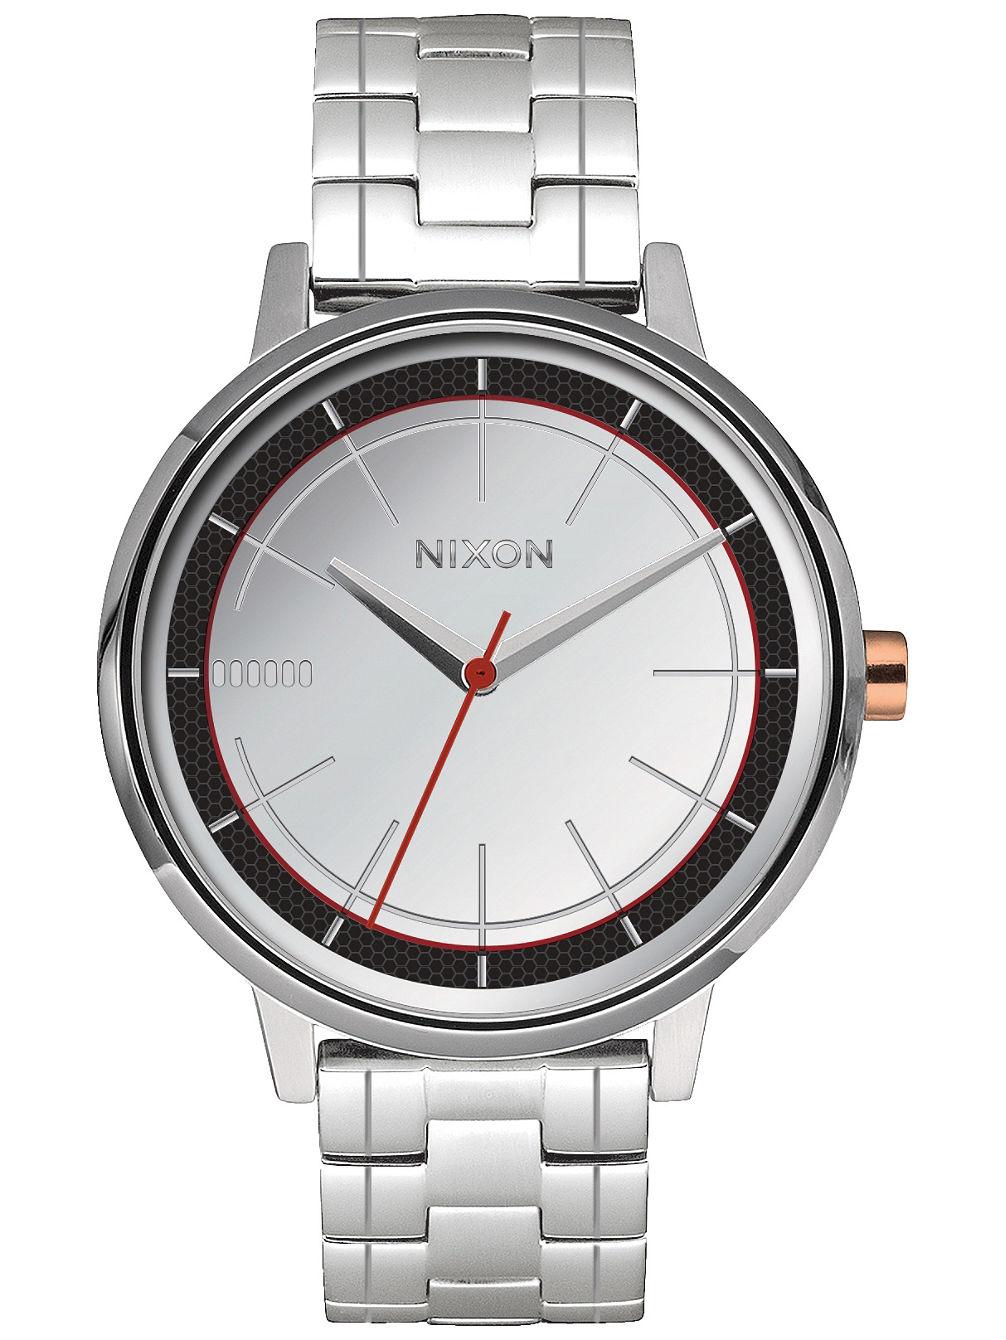 nixon-the-kensington-star-wars